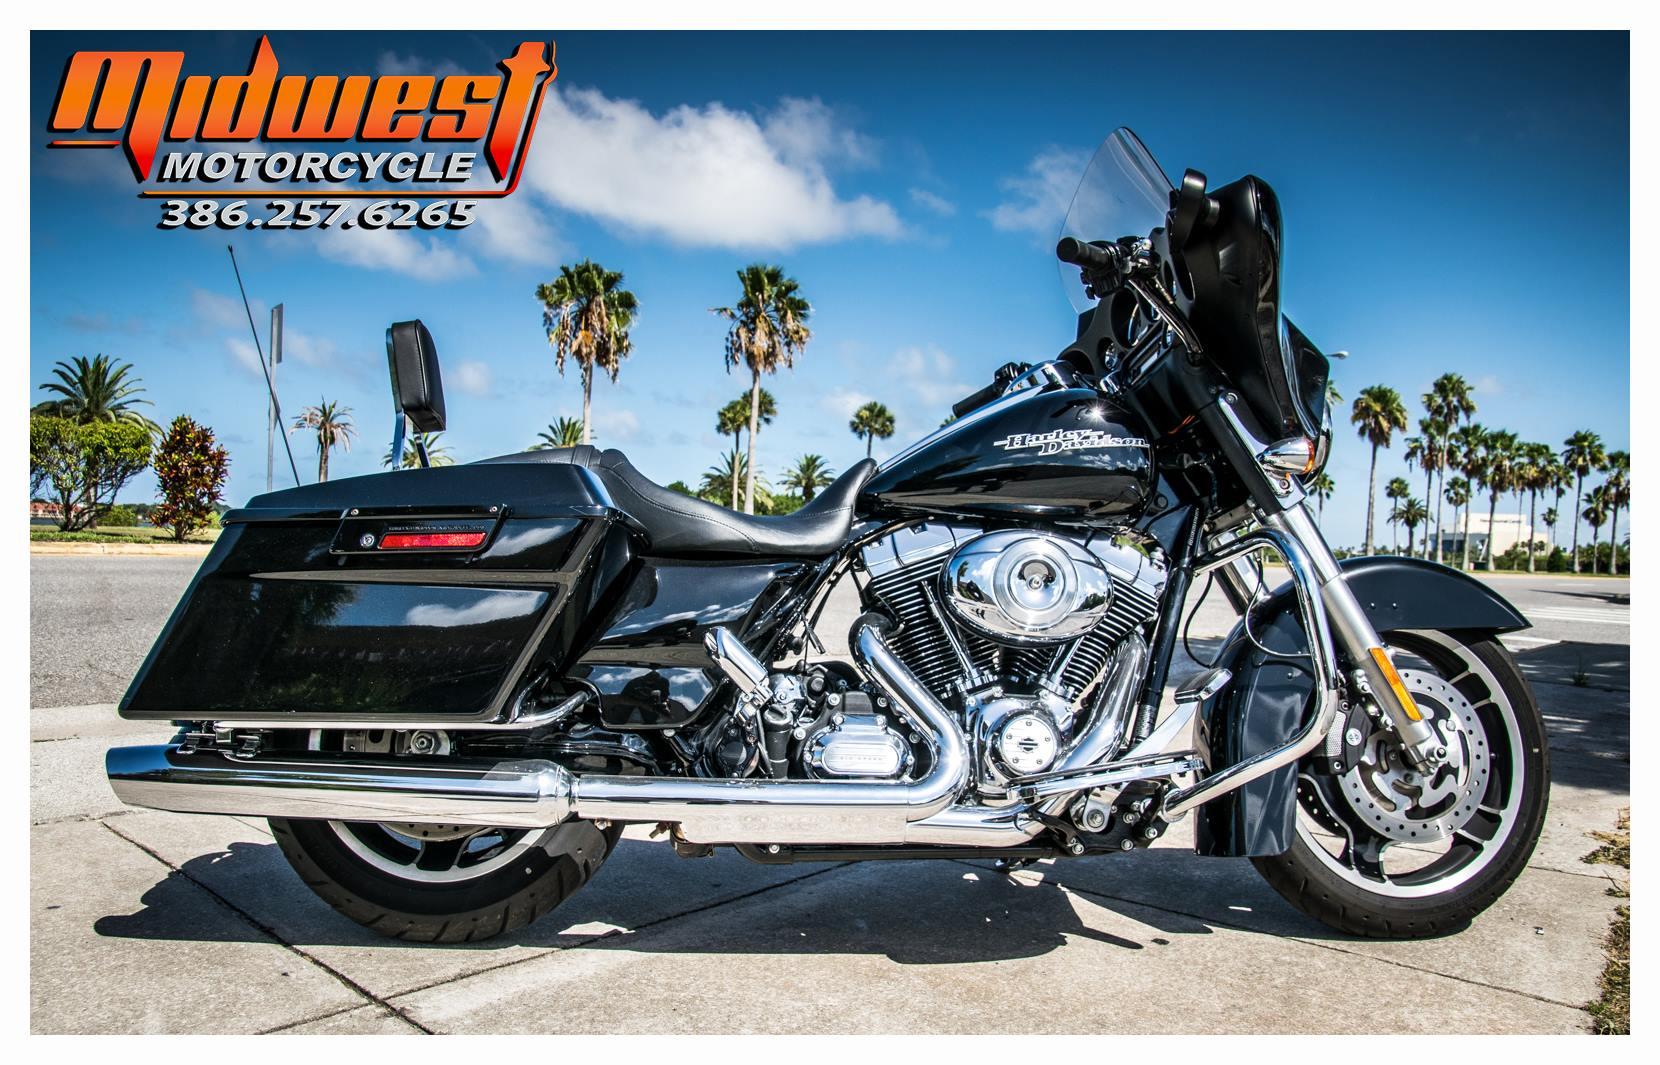 2012 Harley-Davidson® STREET GLIDE for sale in Daytona Beach, FL ...